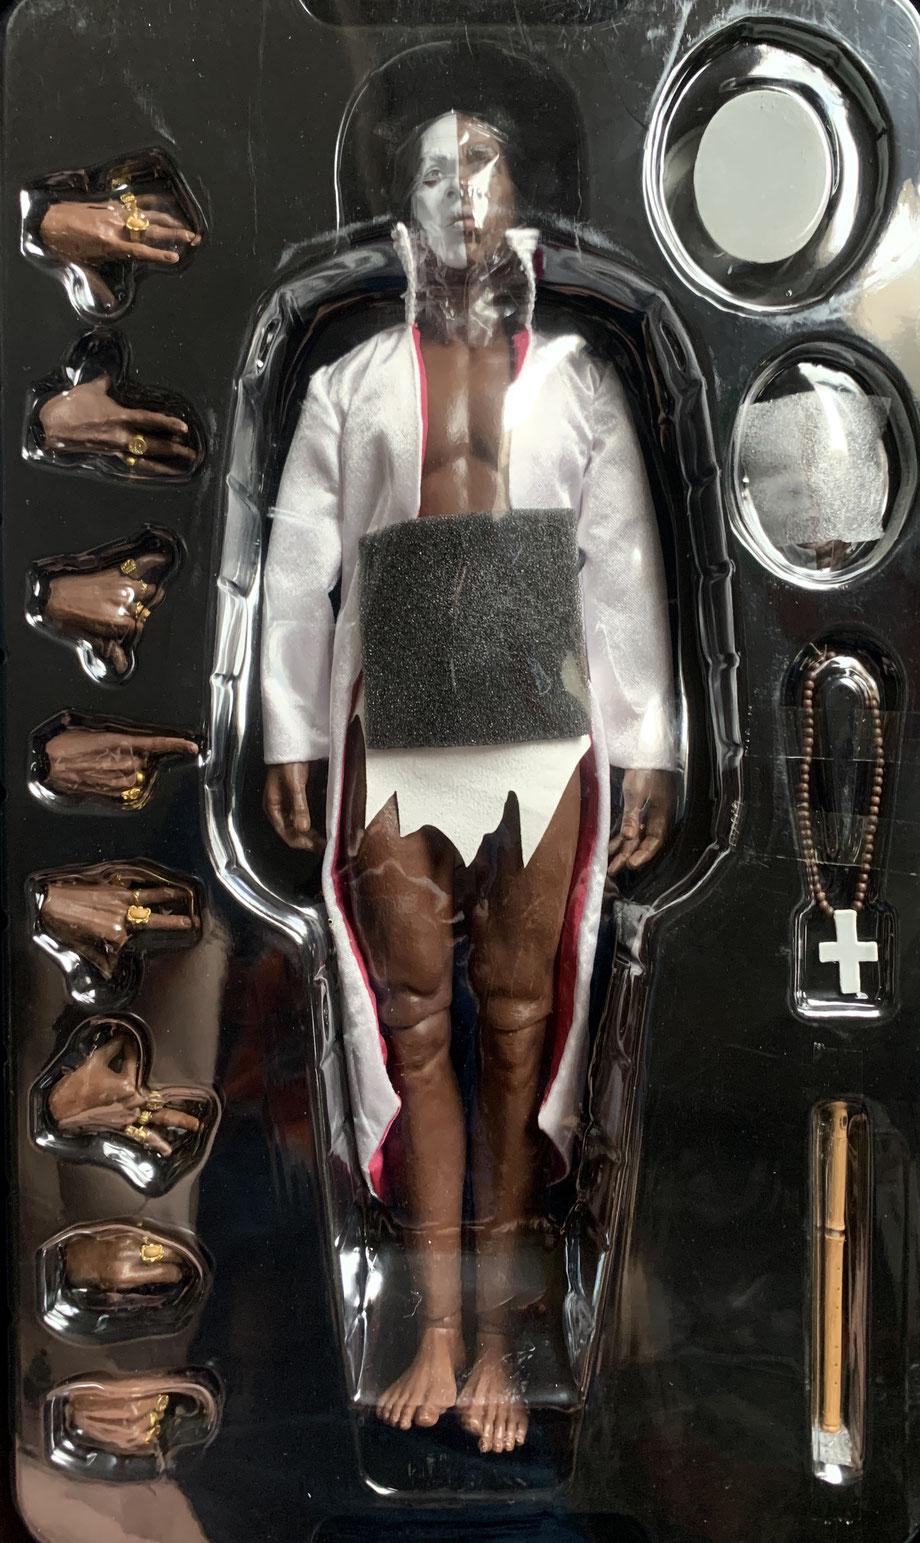 Baron Samedi 1/6 James Bond Leben und sterben lassen Collector Figure Series 30cm Actionfigur Big Chief Studios